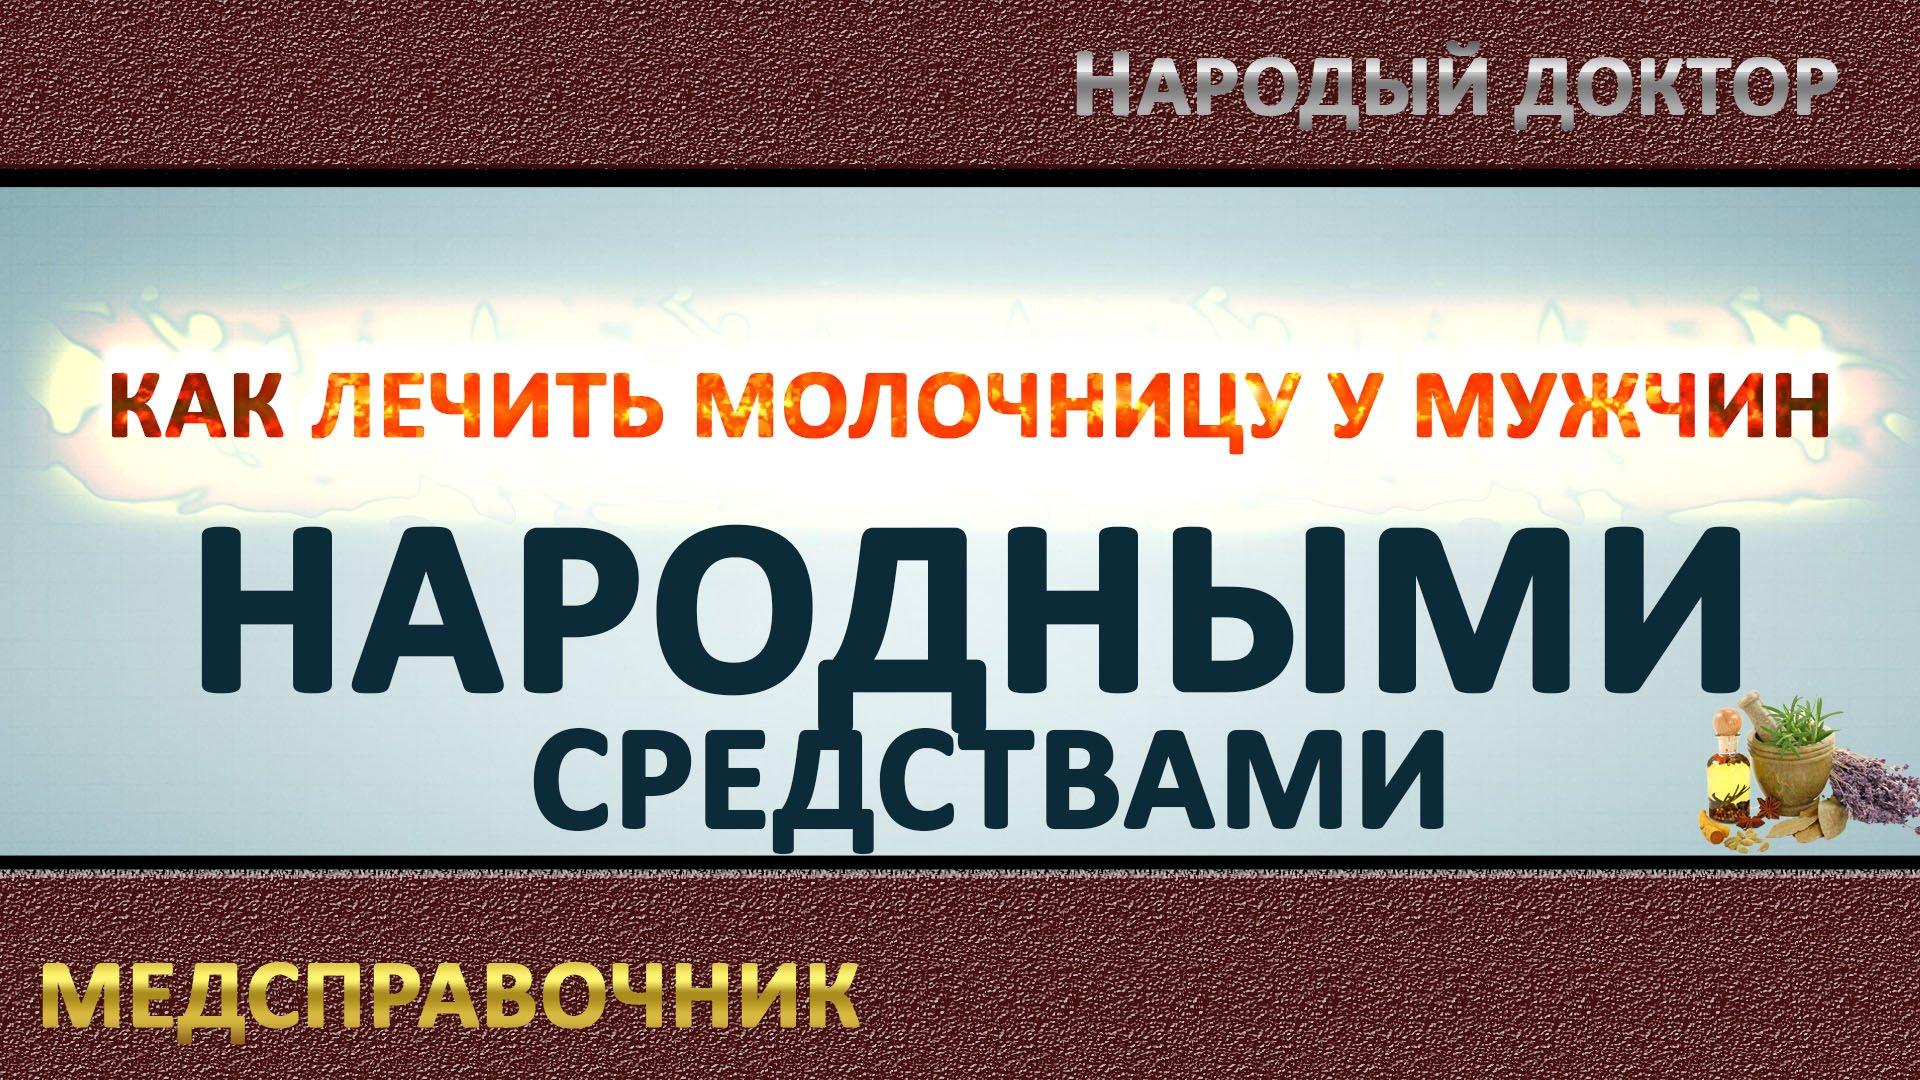 1502072913_maxresdefault.jpg